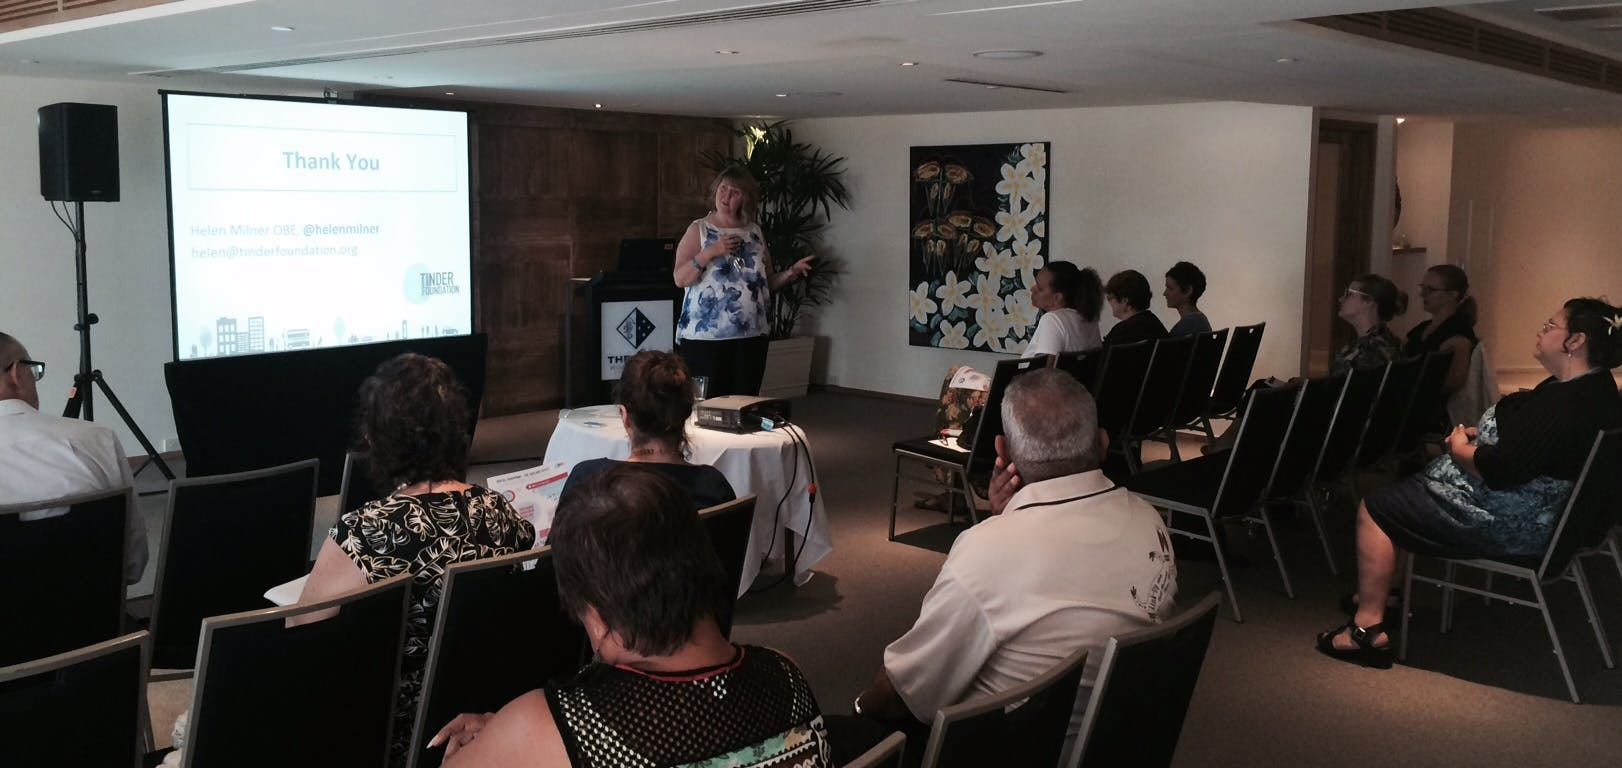 13 June 2016: International Digital Thought Leader - Helen Milner, touring in Cairns